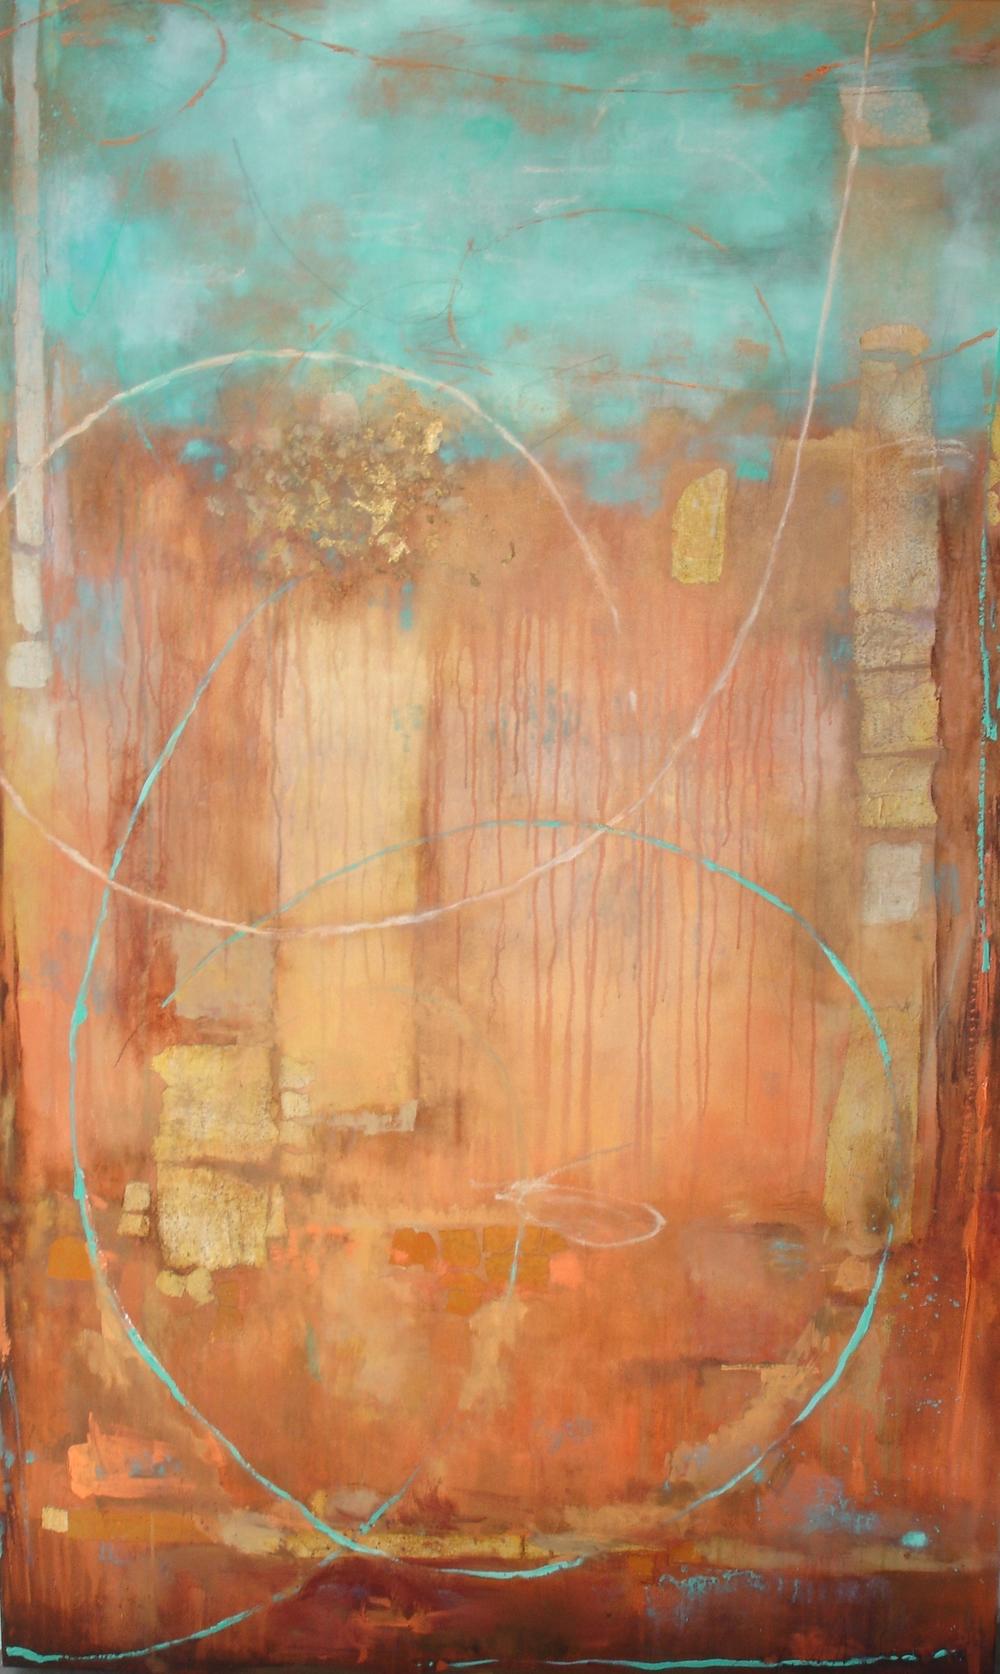 Radiance, 112 x 183cm